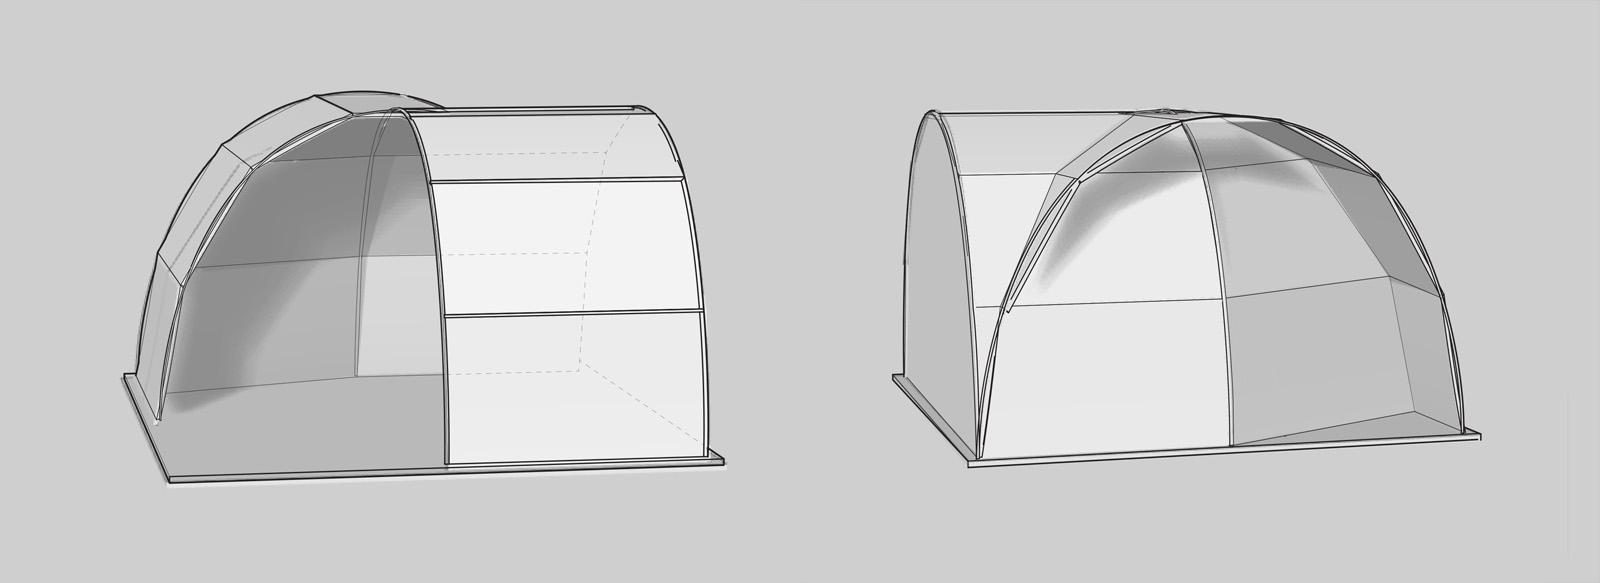 igloo+ dome hybrid